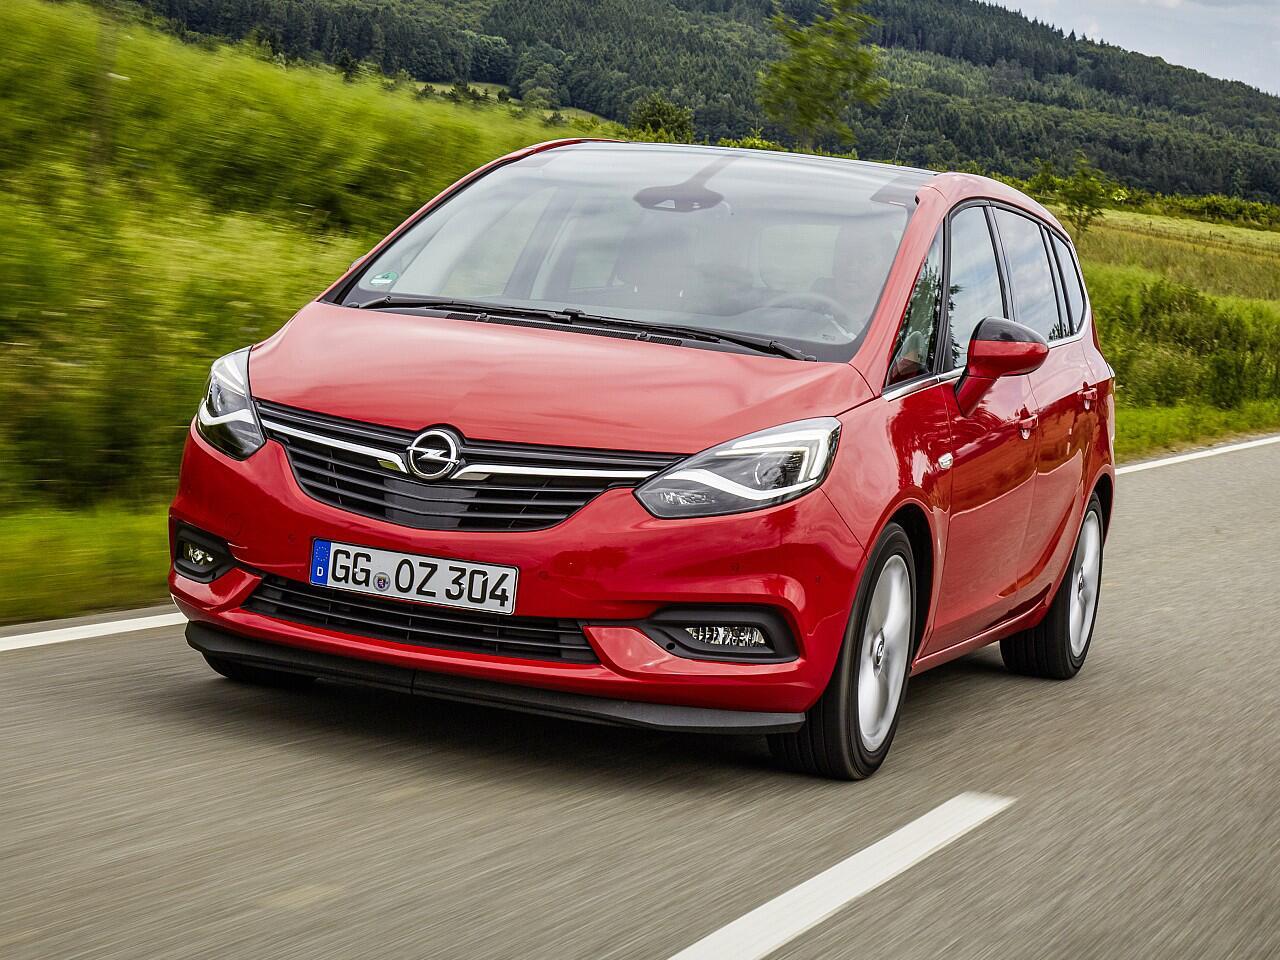 Bild zu Kompaktvans: Opel Zafira